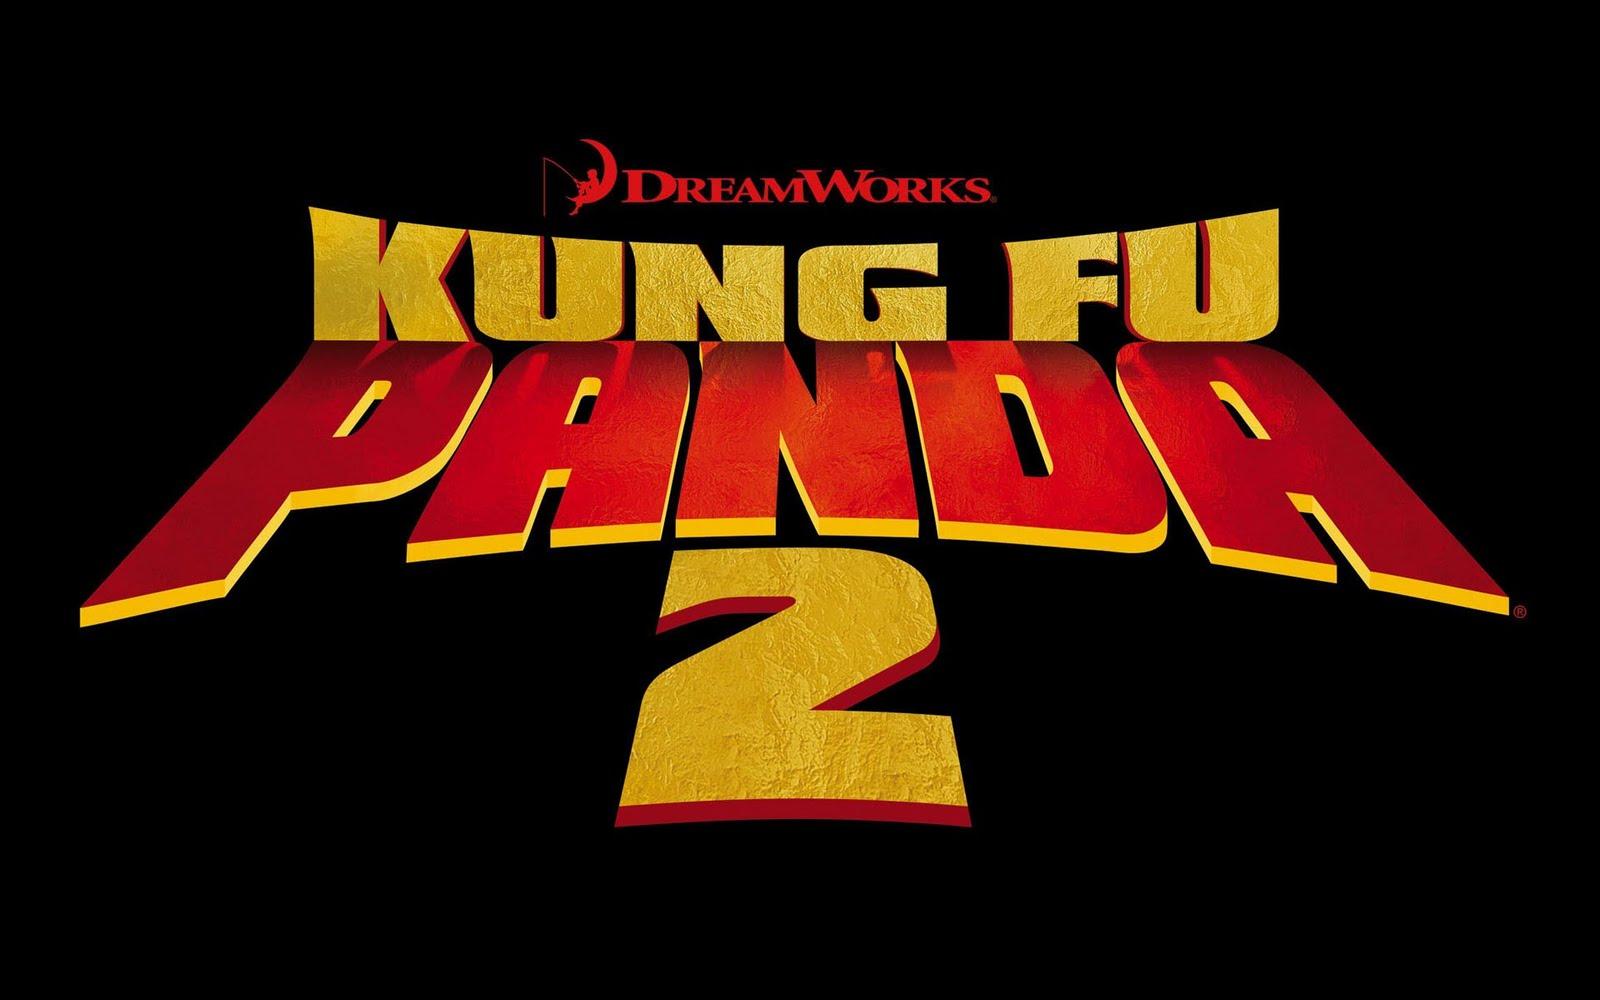 http://1.bp.blogspot.com/-atSGbyCoTcI/TduqMrRdABI/AAAAAAAACEQ/DbKv6_KMFNo/s1600/Kung+Fu+Panda+2+Wallpaper+13.jpg